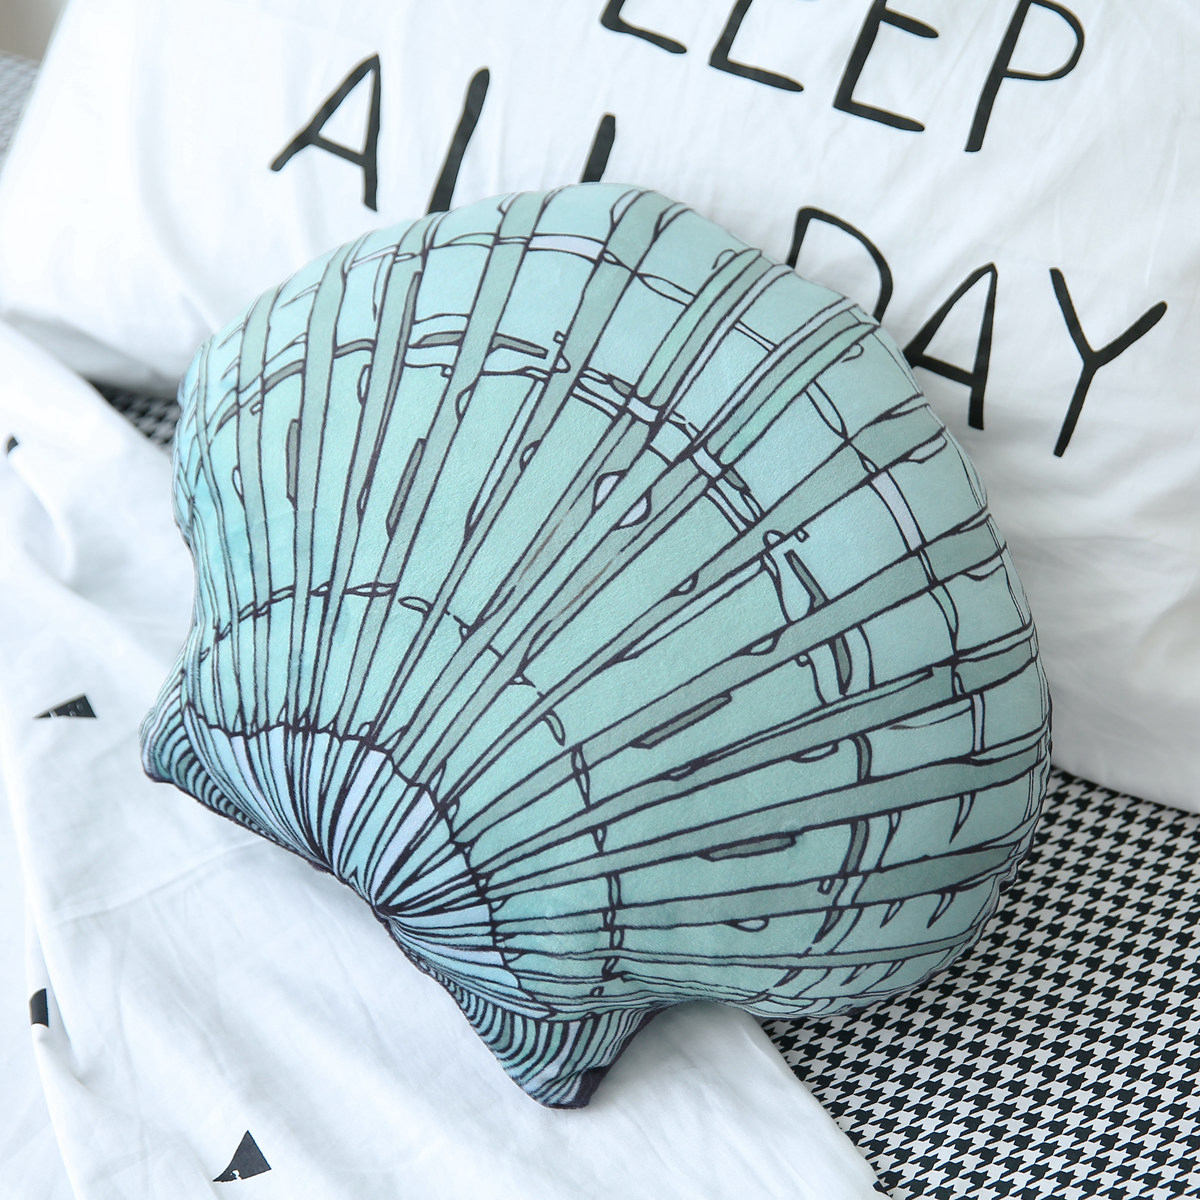 Shell Hug Cushion Country Style Decorative Camera Props, Sofa Hugs Pillow Lumbar Vivid Beach Shells Pillow